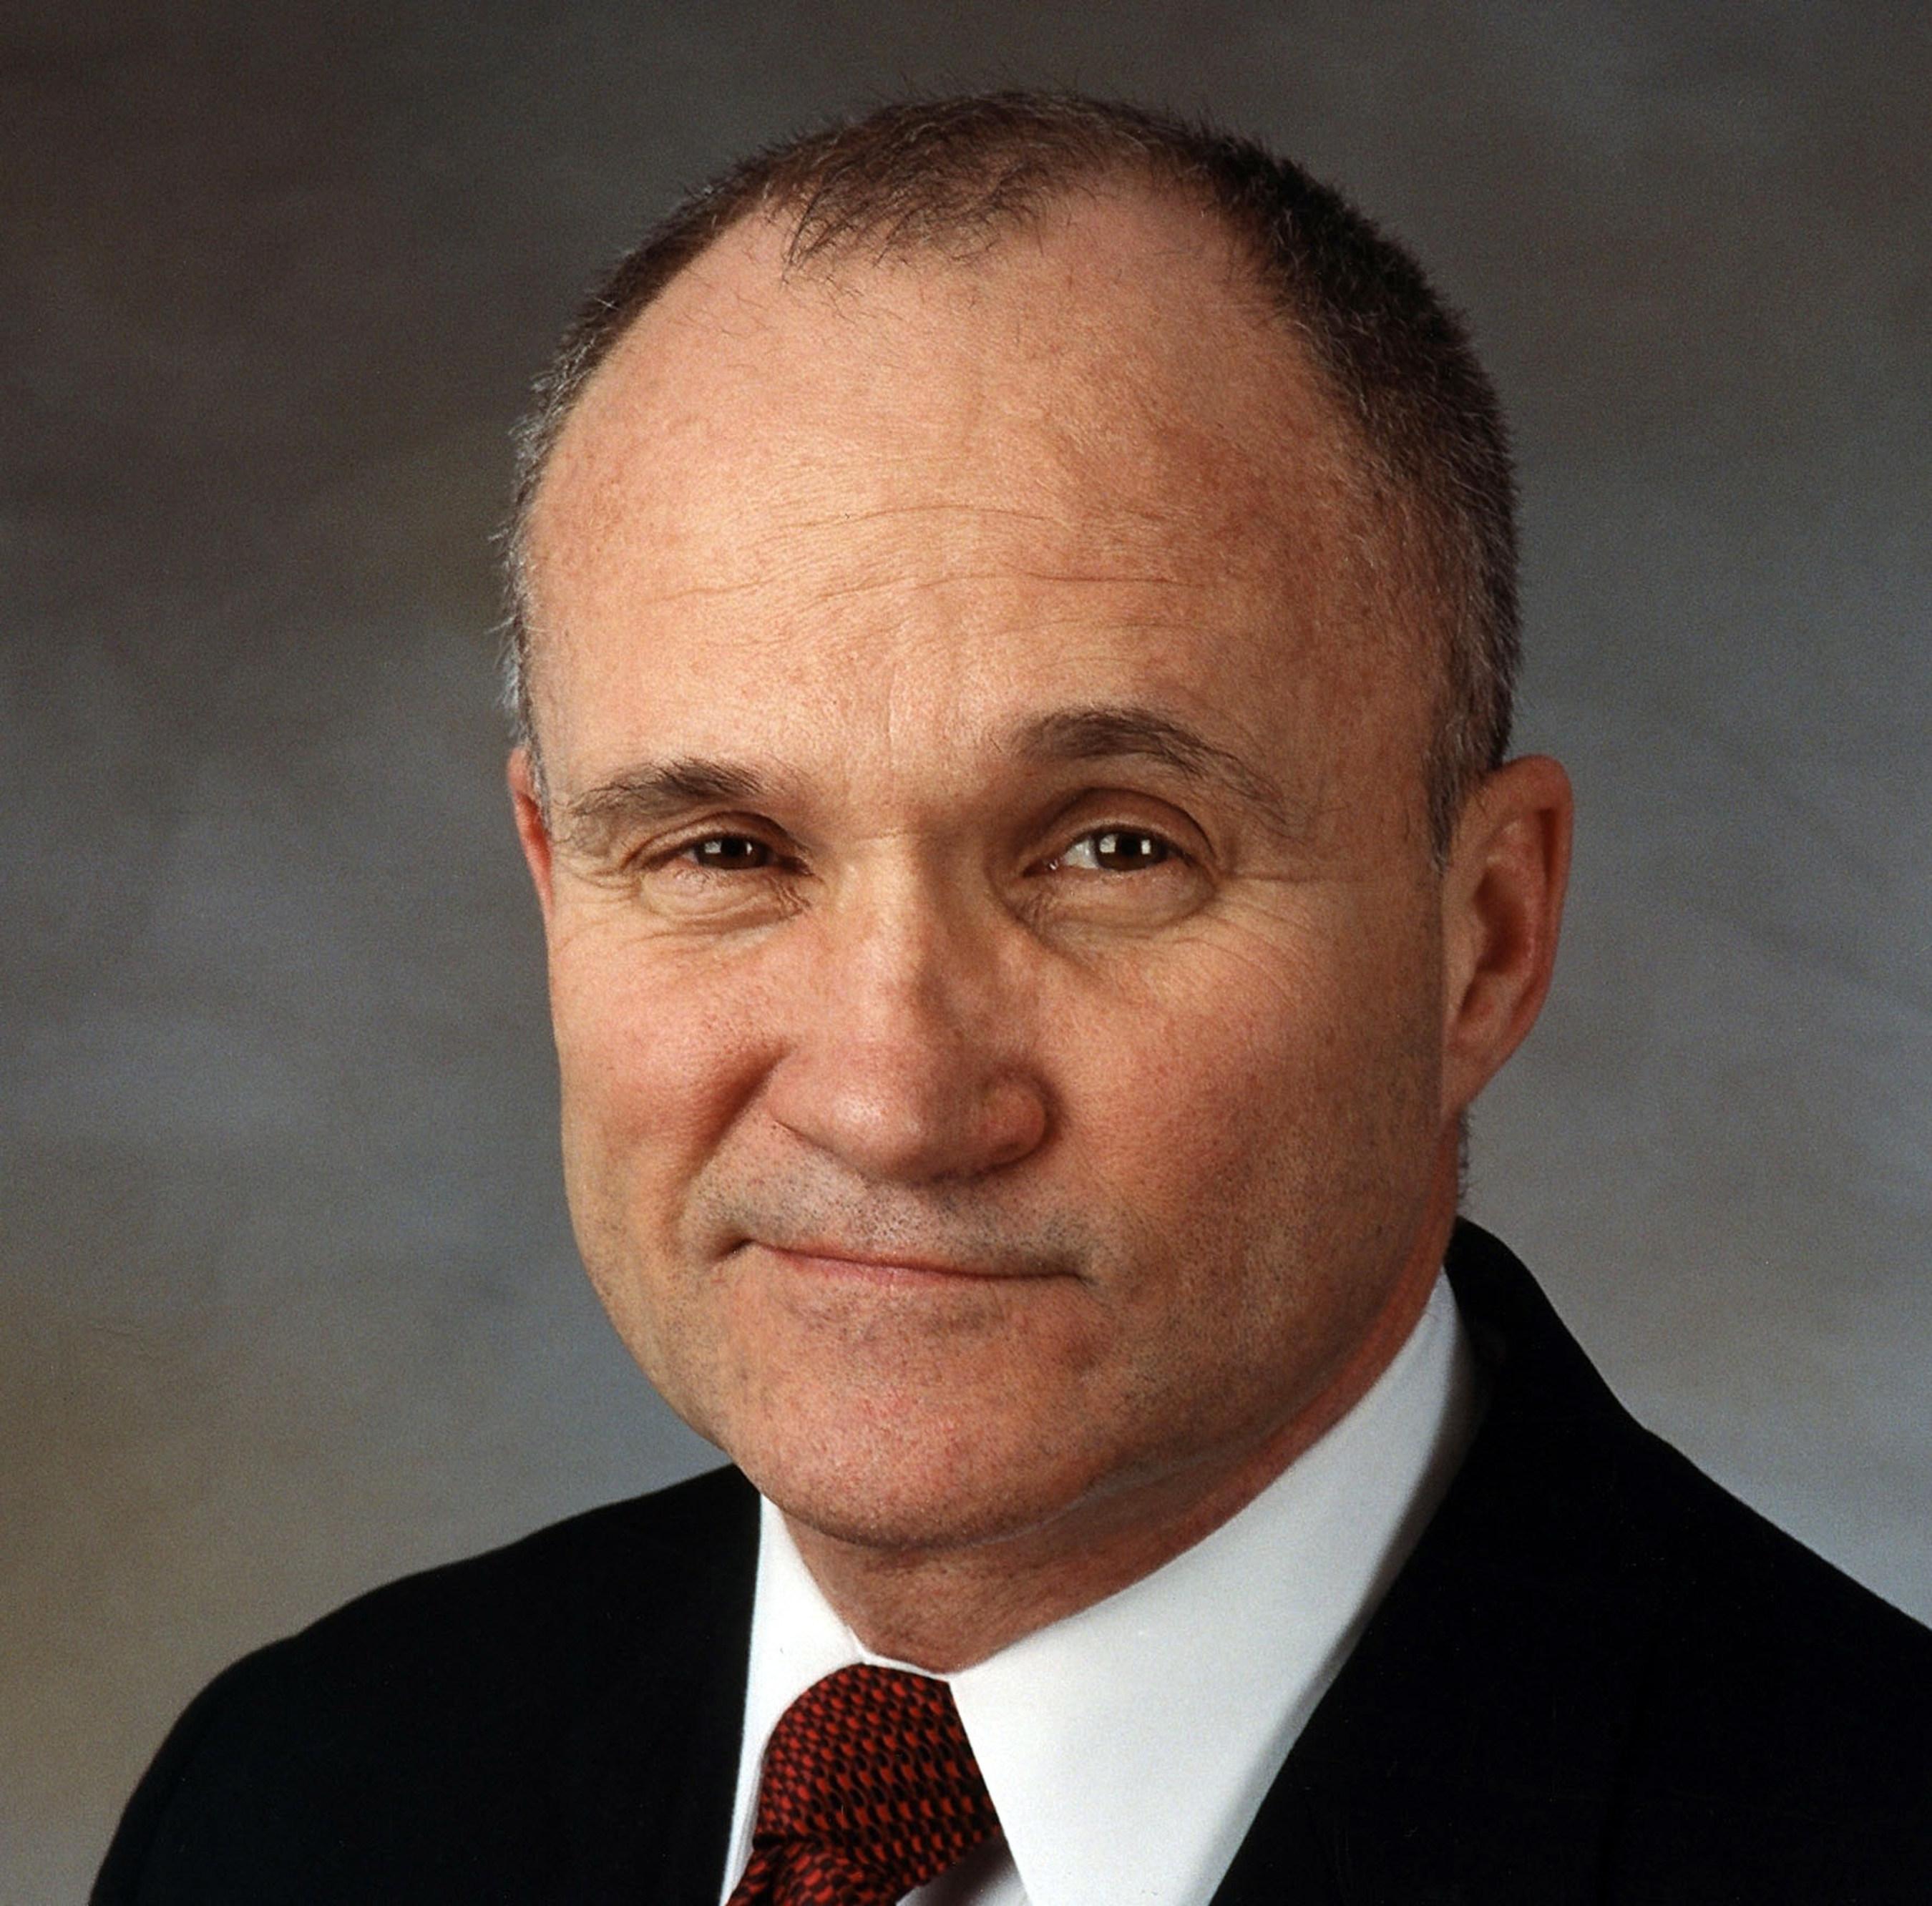 Raymond W. Kelly